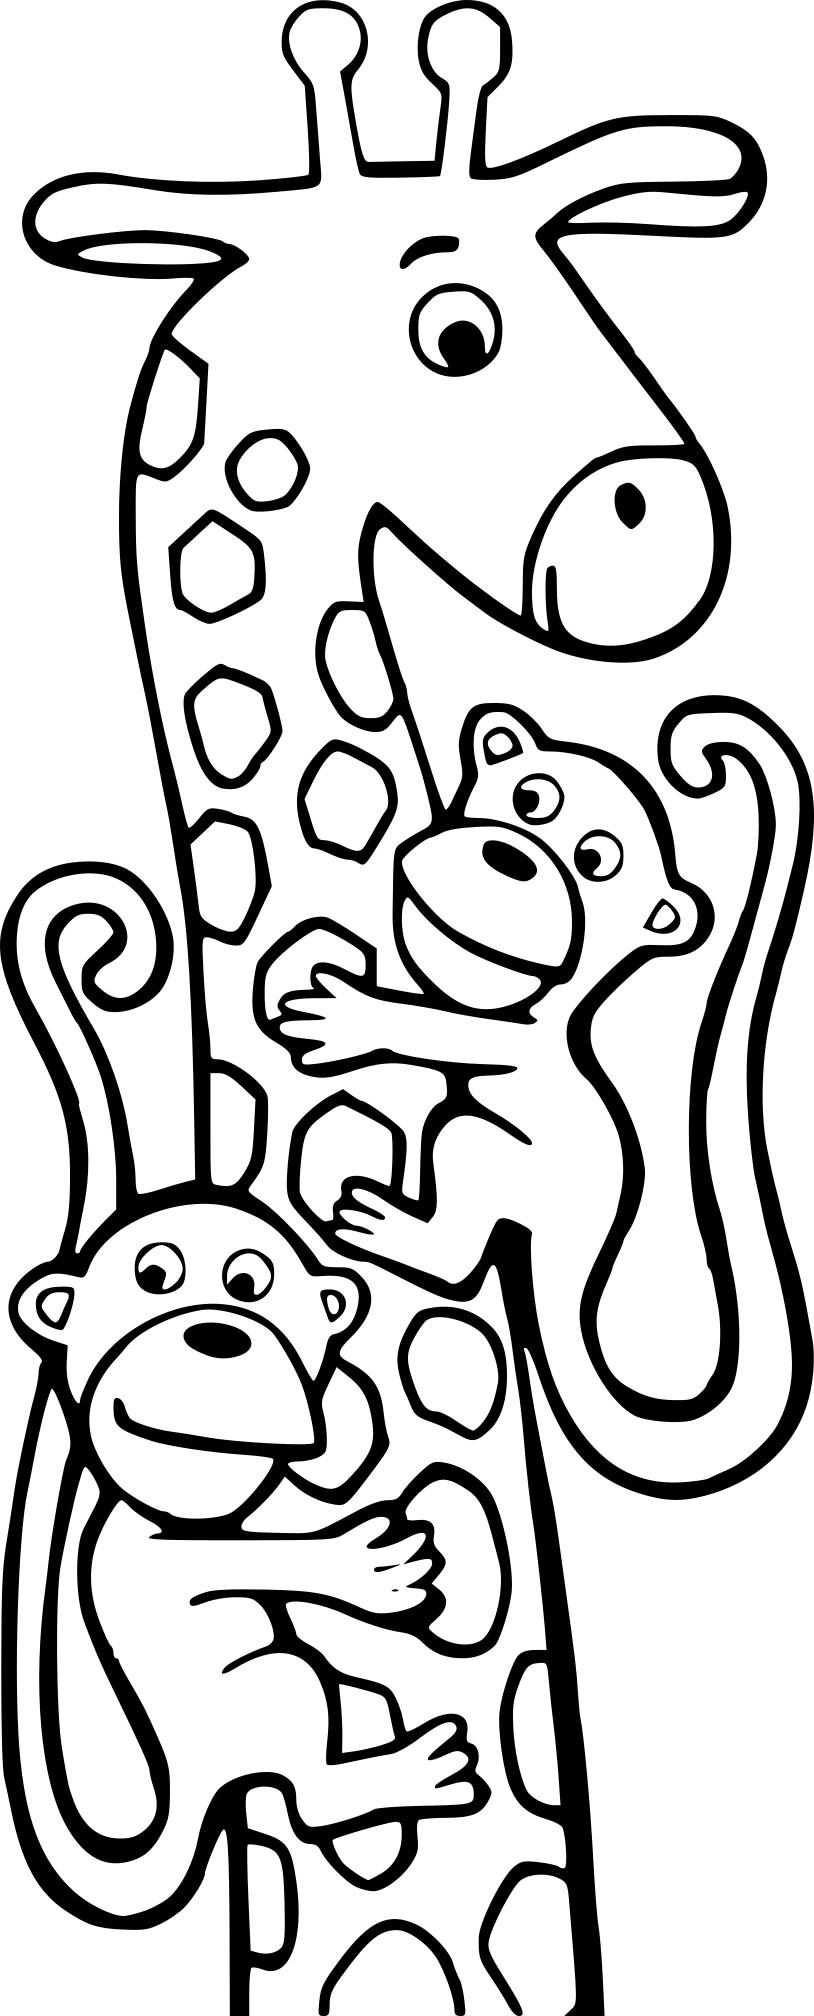 Coloriage girafe et singe